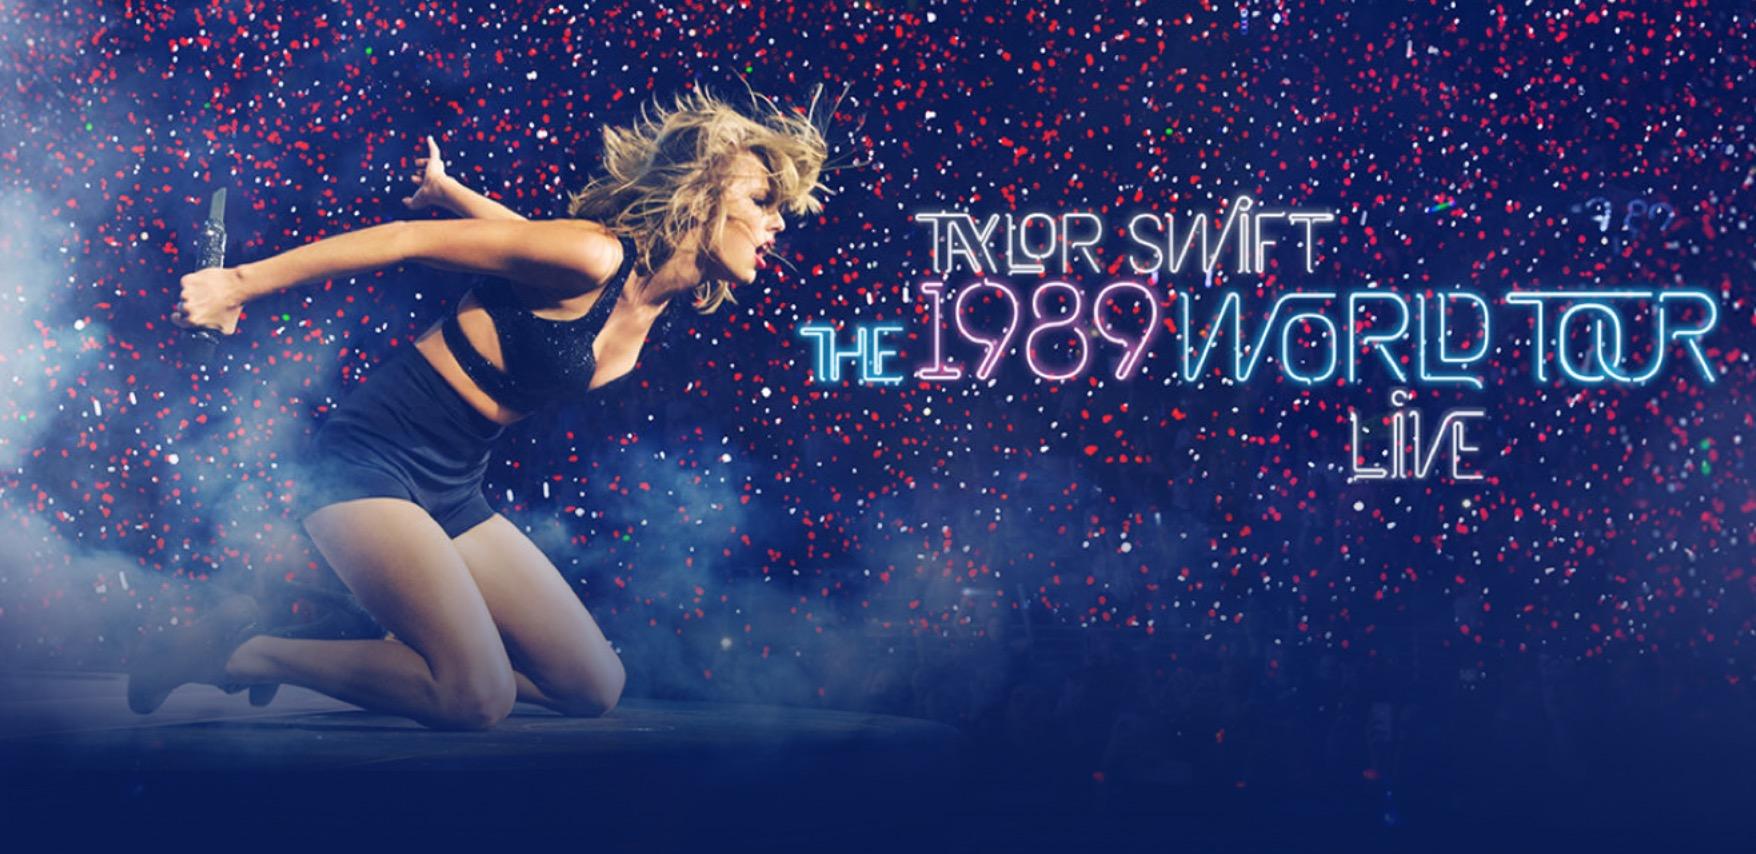 Taylor Swift Live 1989 World Tour Movie